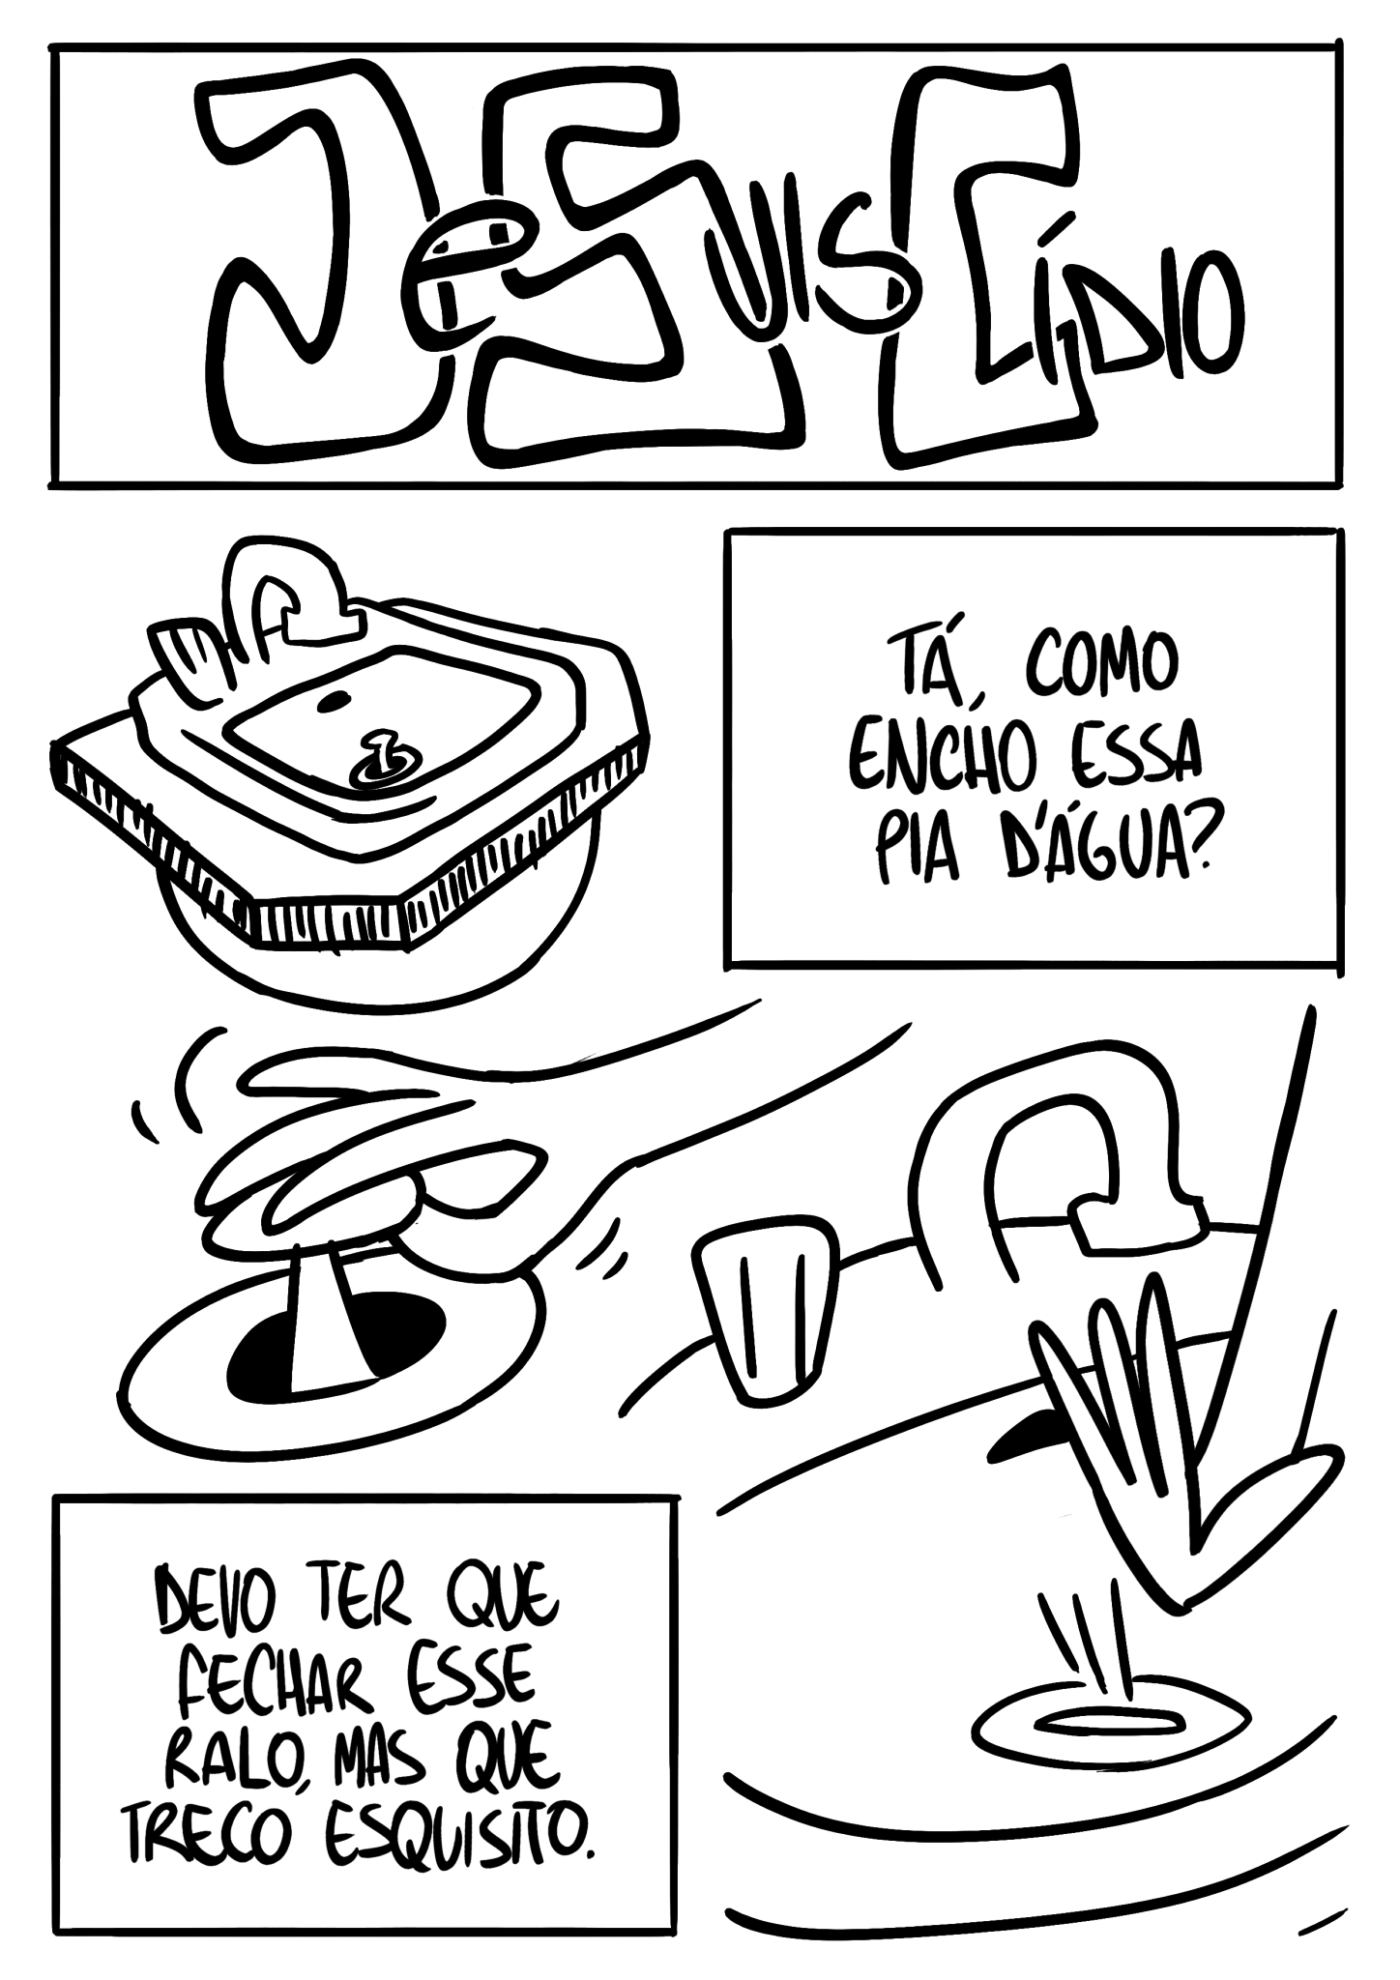 Je Suis Cídio #13, por João B. Godoi